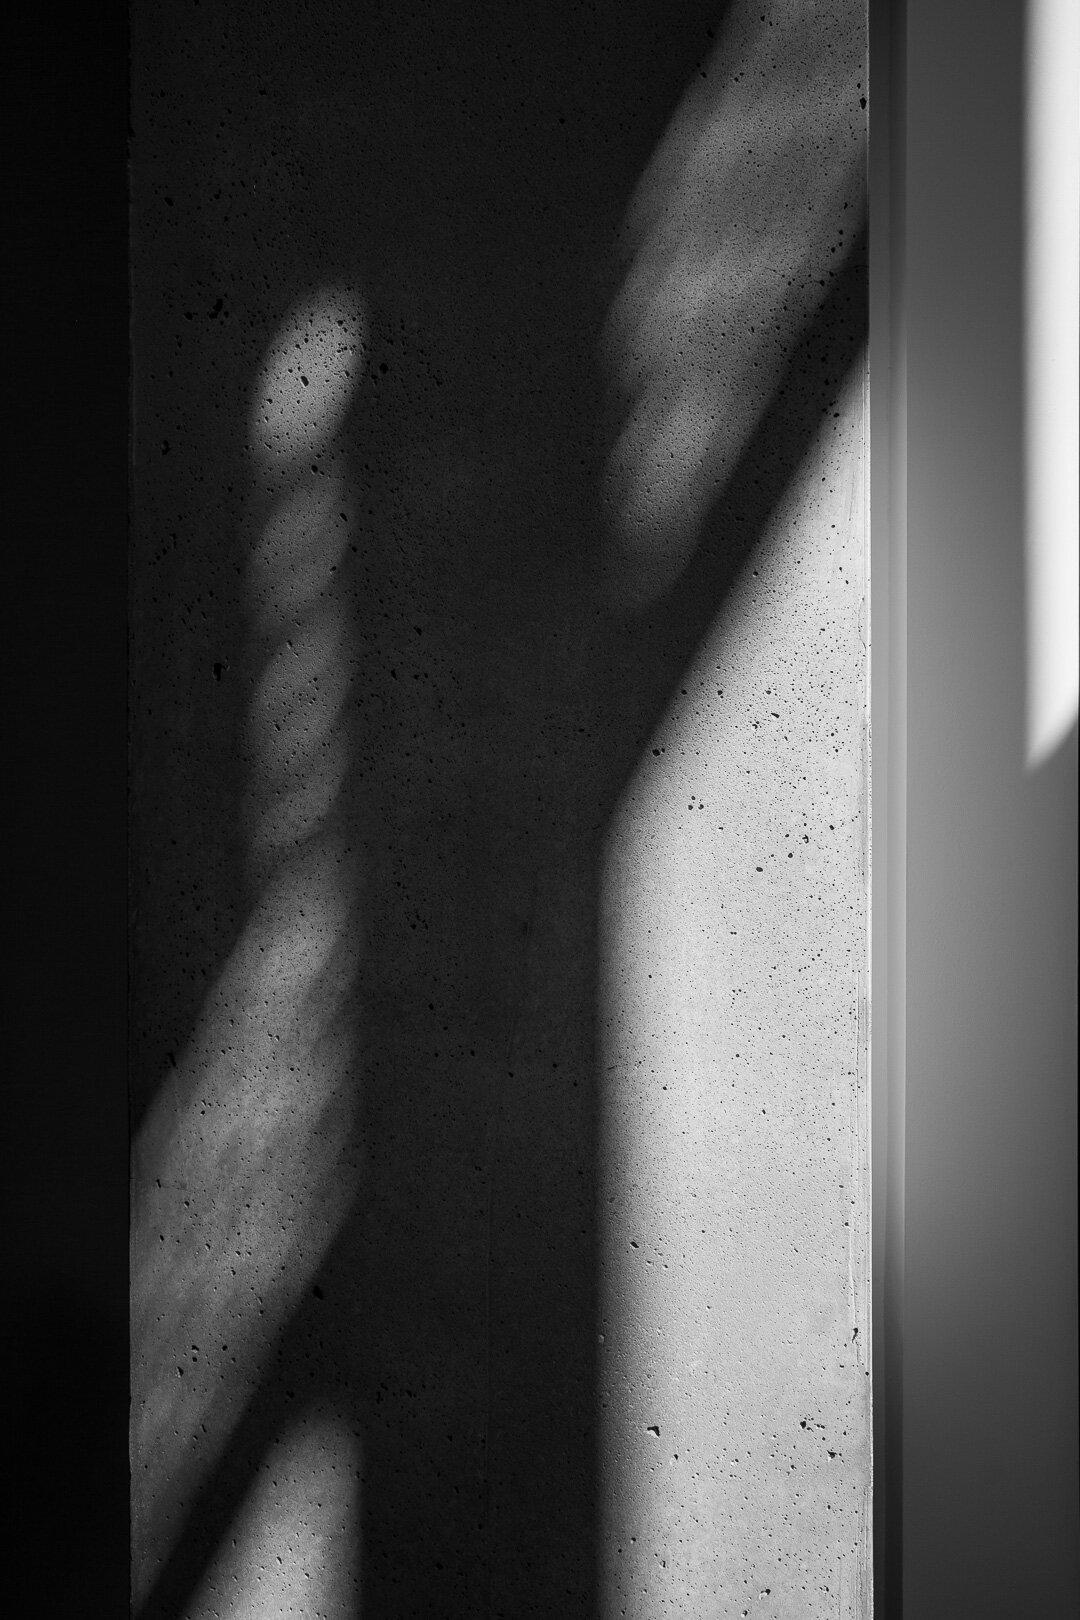 cse_shadows-3.jpg